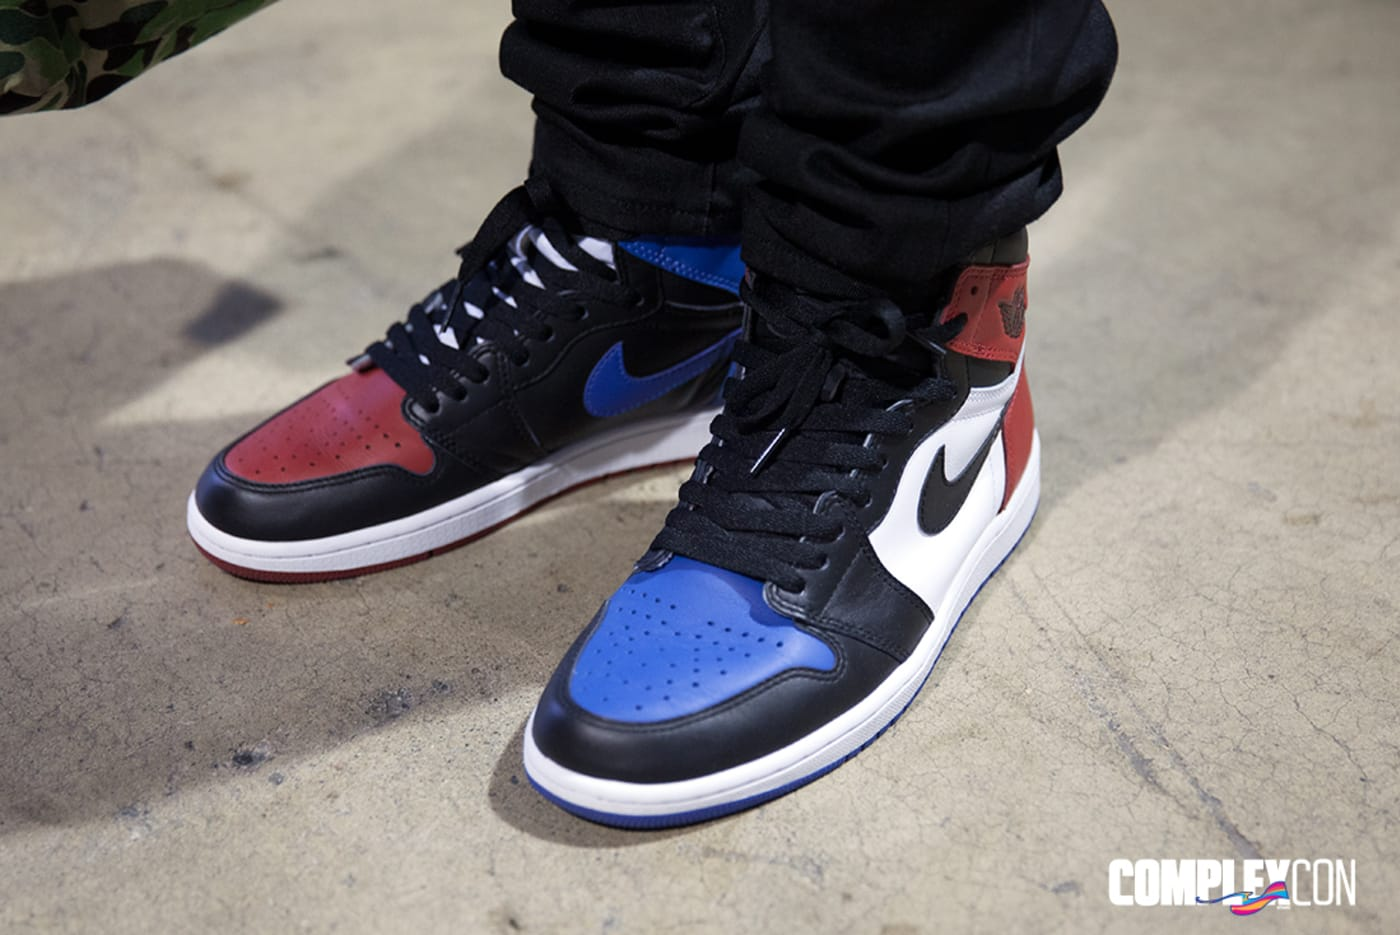 Top 3 Air Jordan 1 ComplexCon